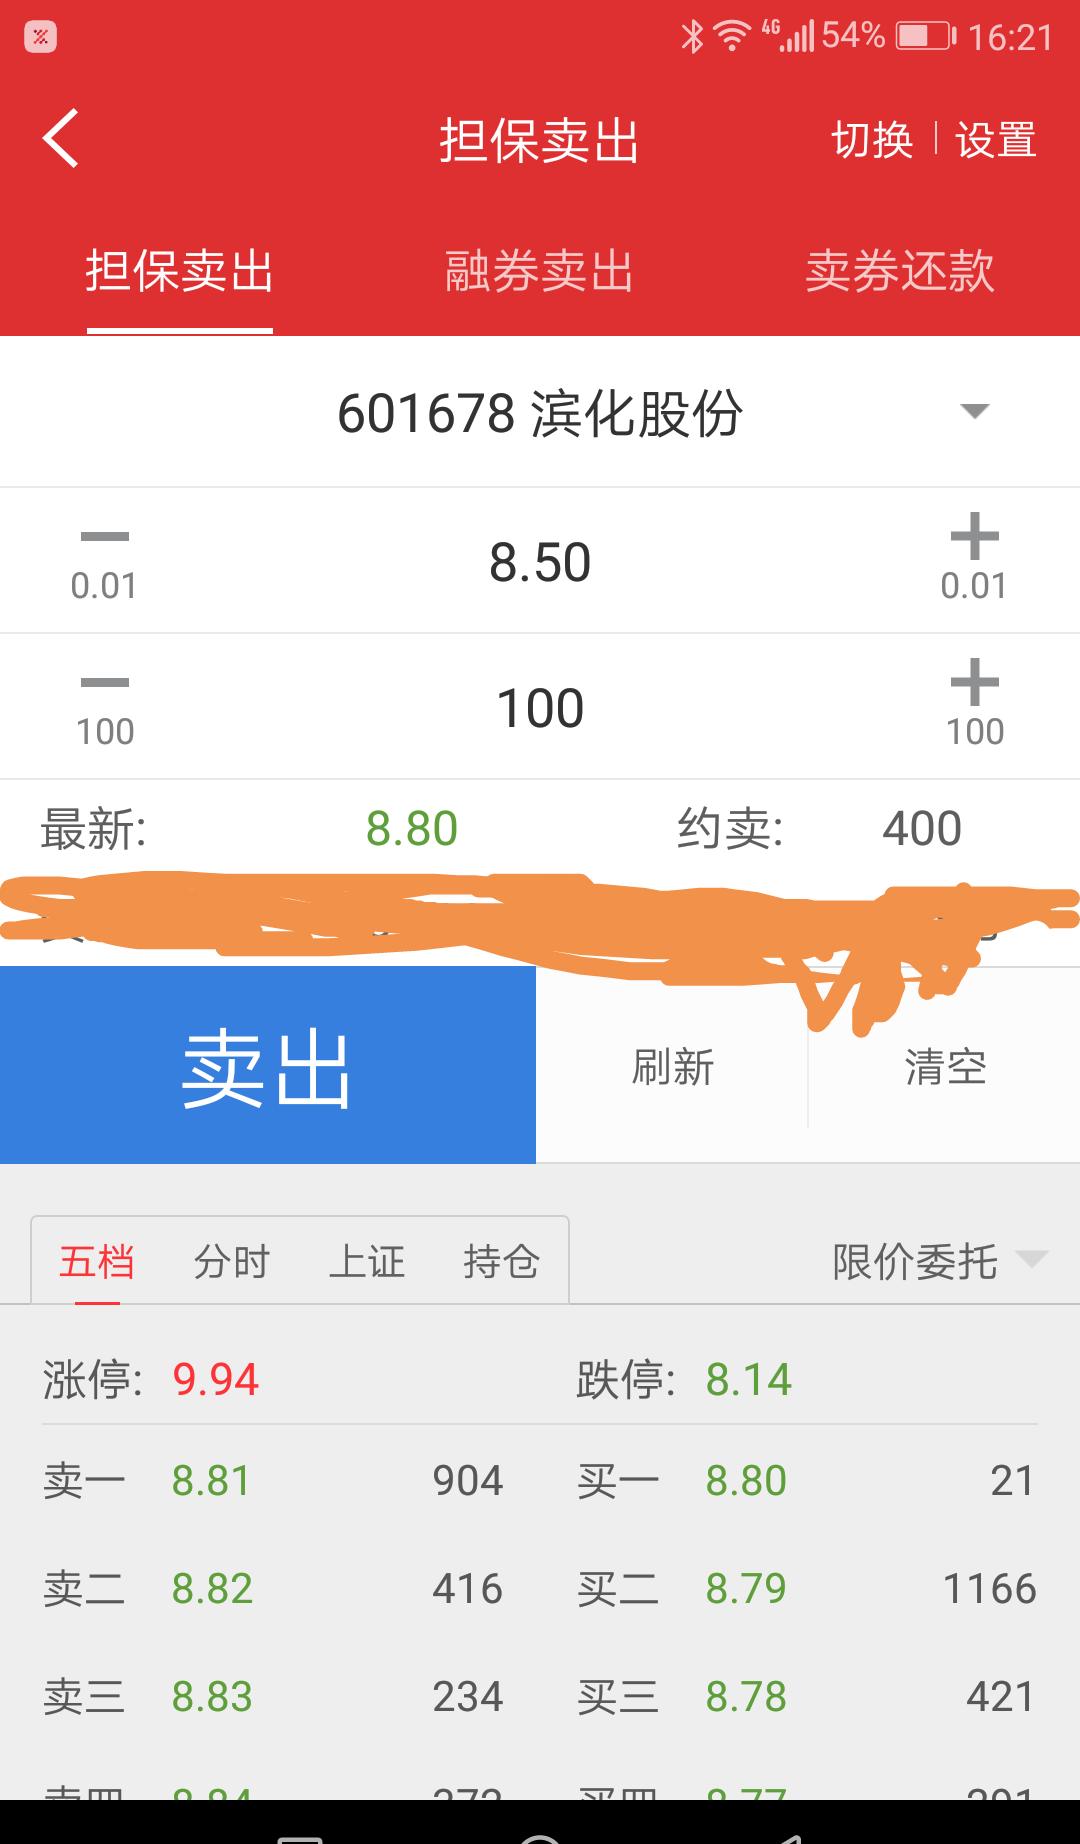 qq普通号升级变成靓号_购买普通qq号_普通qq号购买便宜